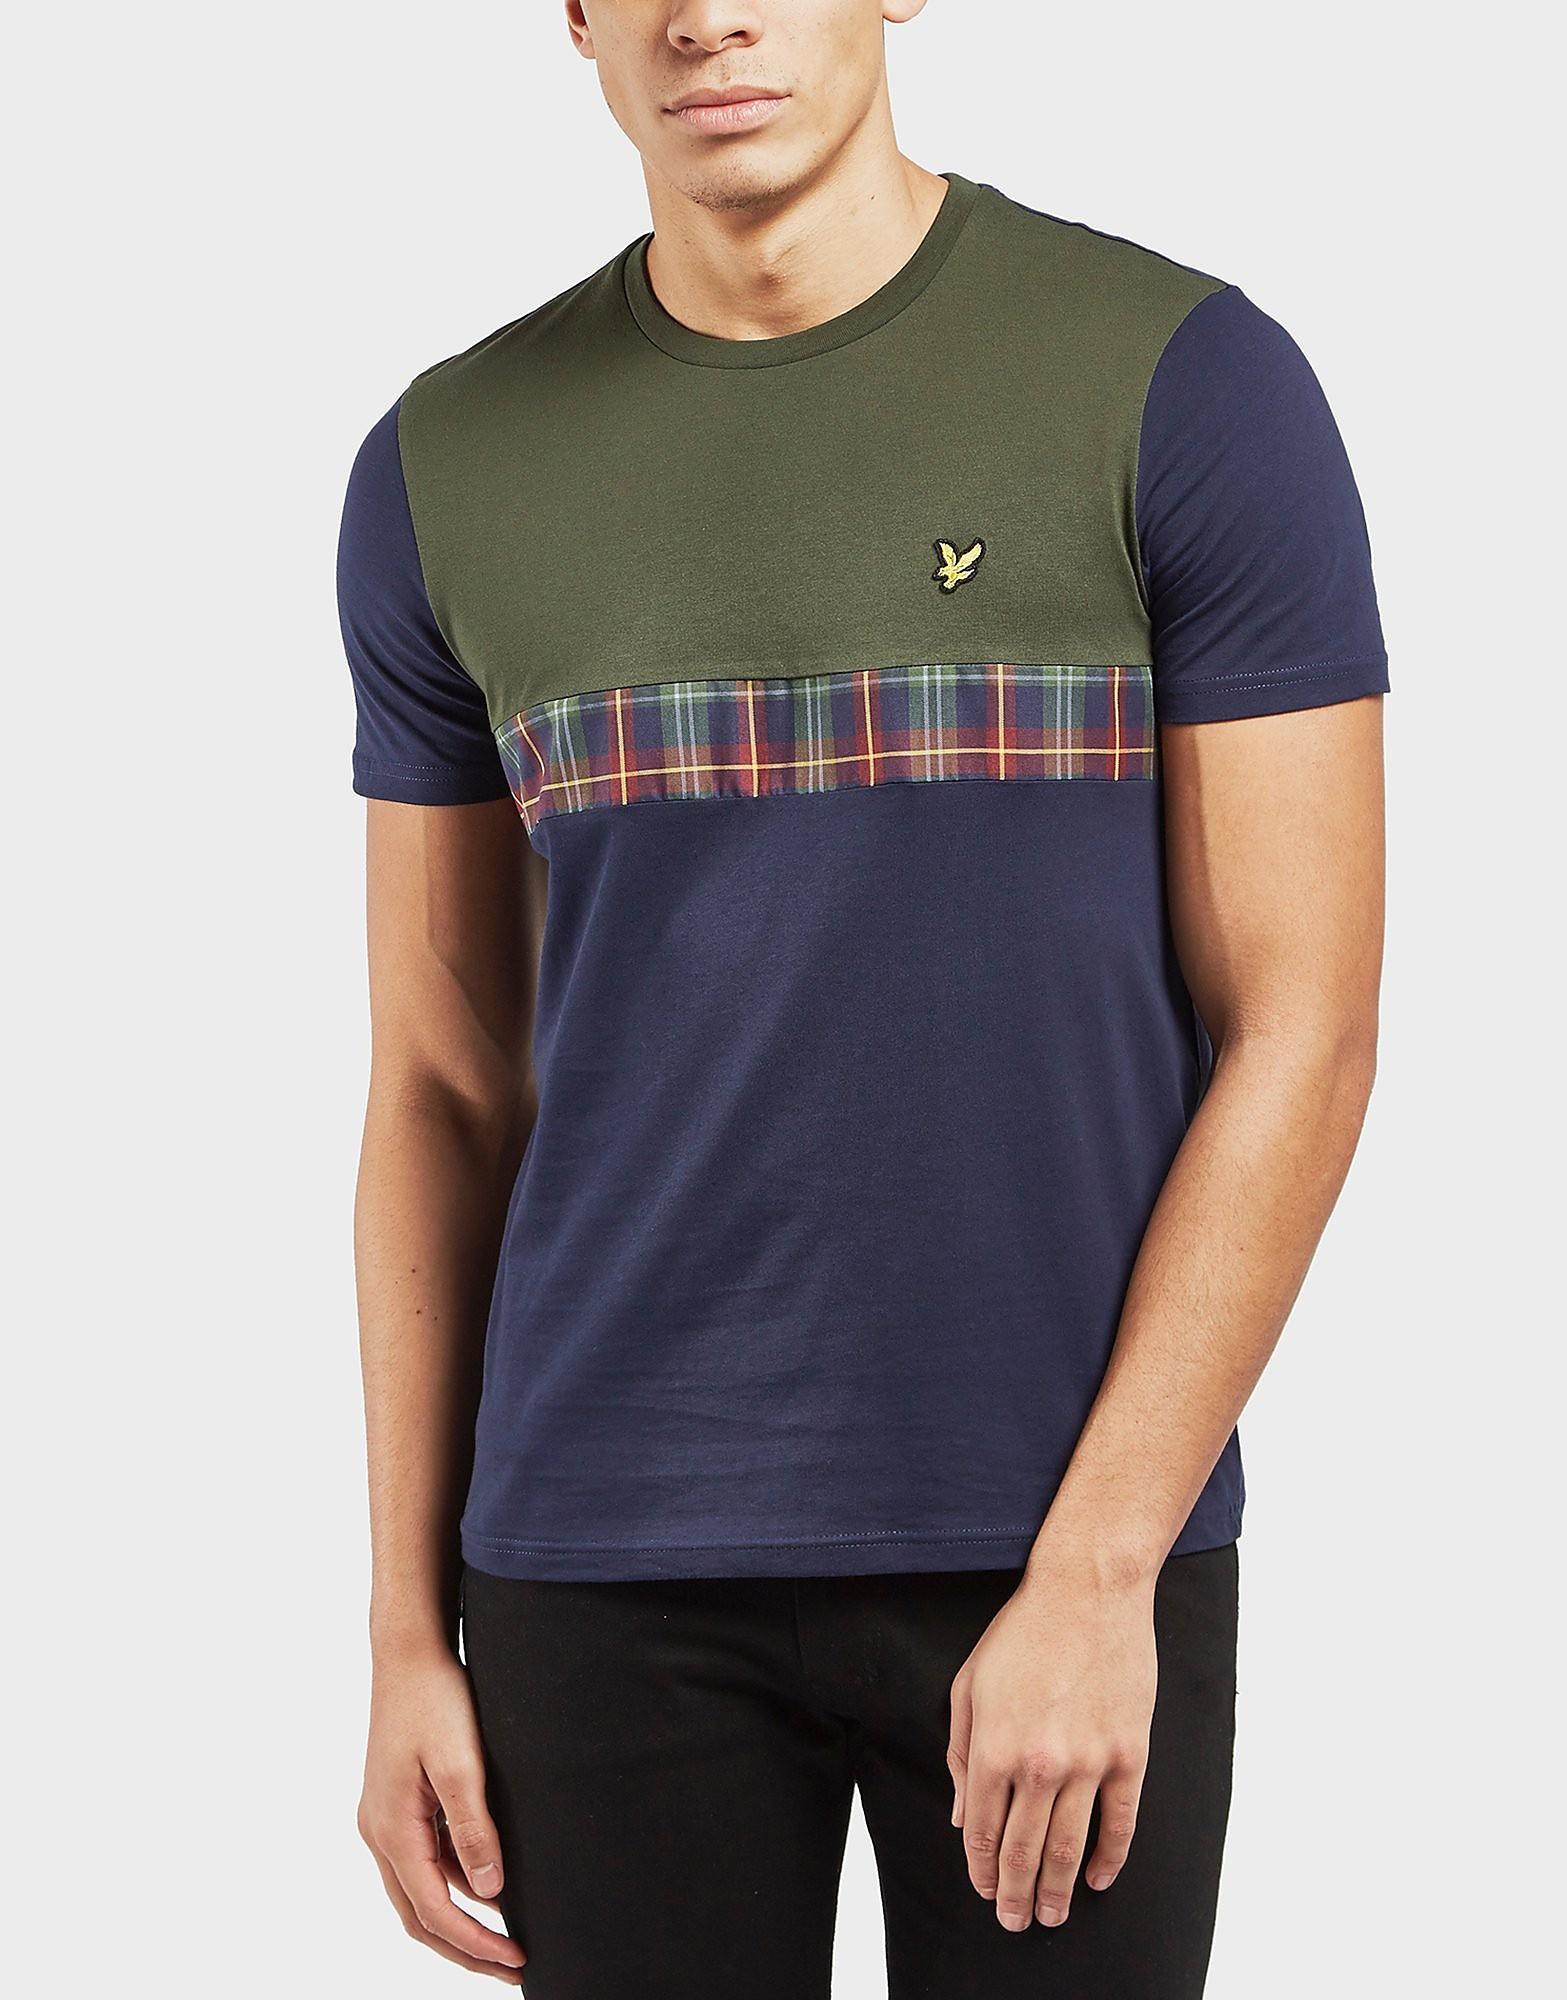 Lyle & Scott C&S Short Sleeve Crew T-Shirt - Exclusive